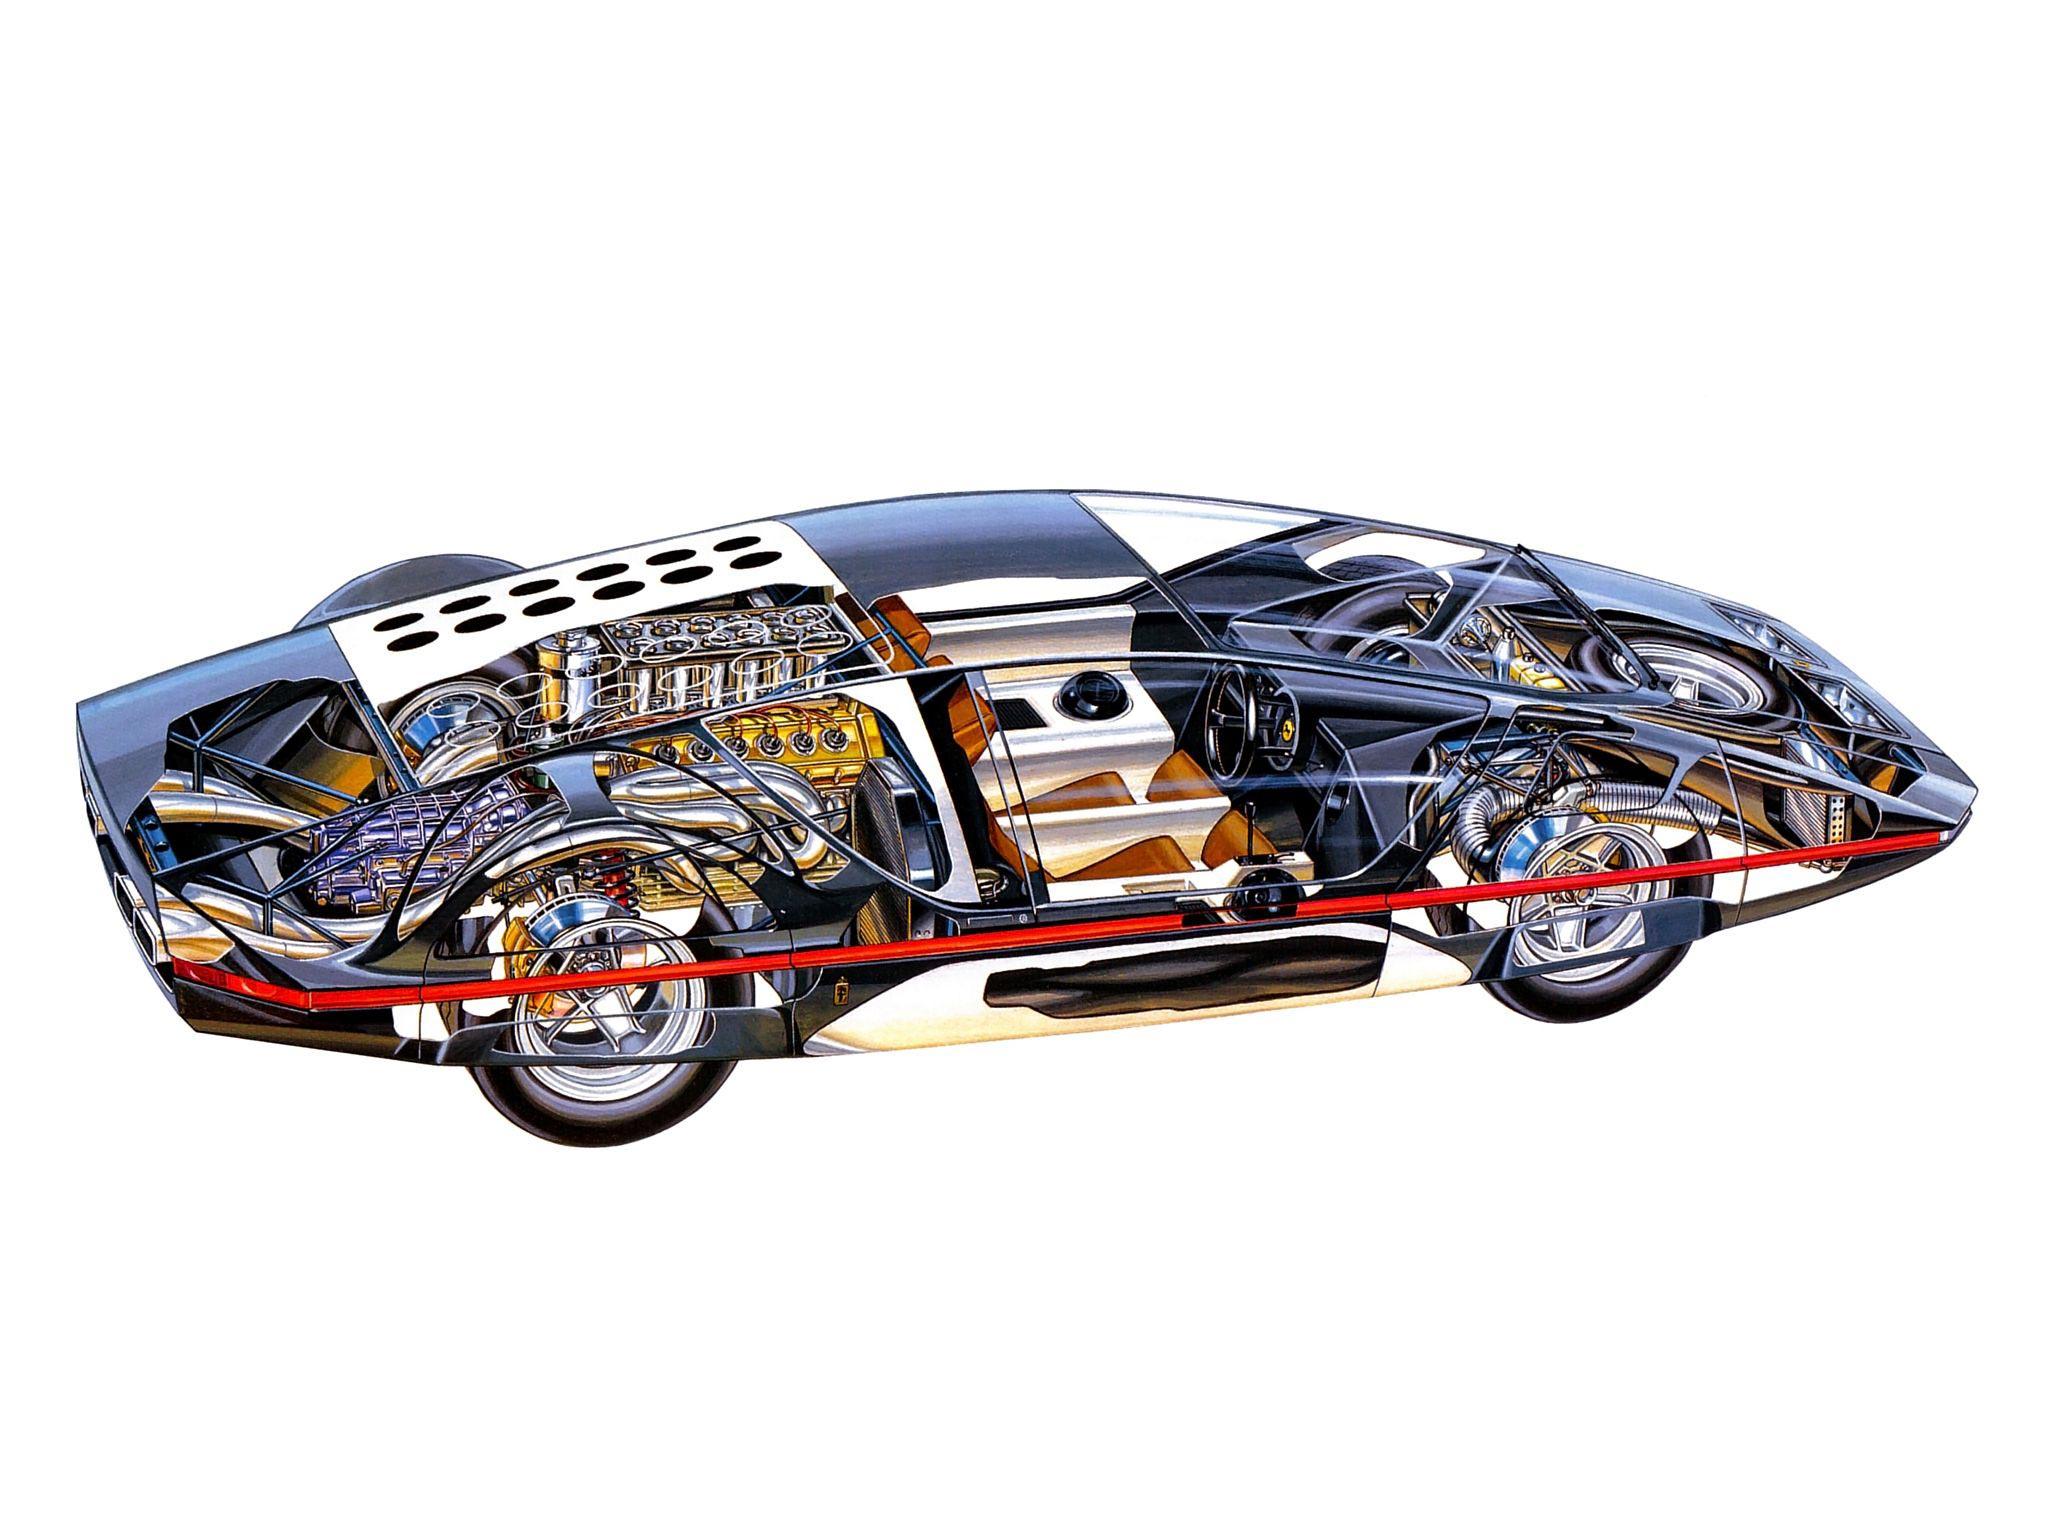 Ferrari Modulo cutaway drawing